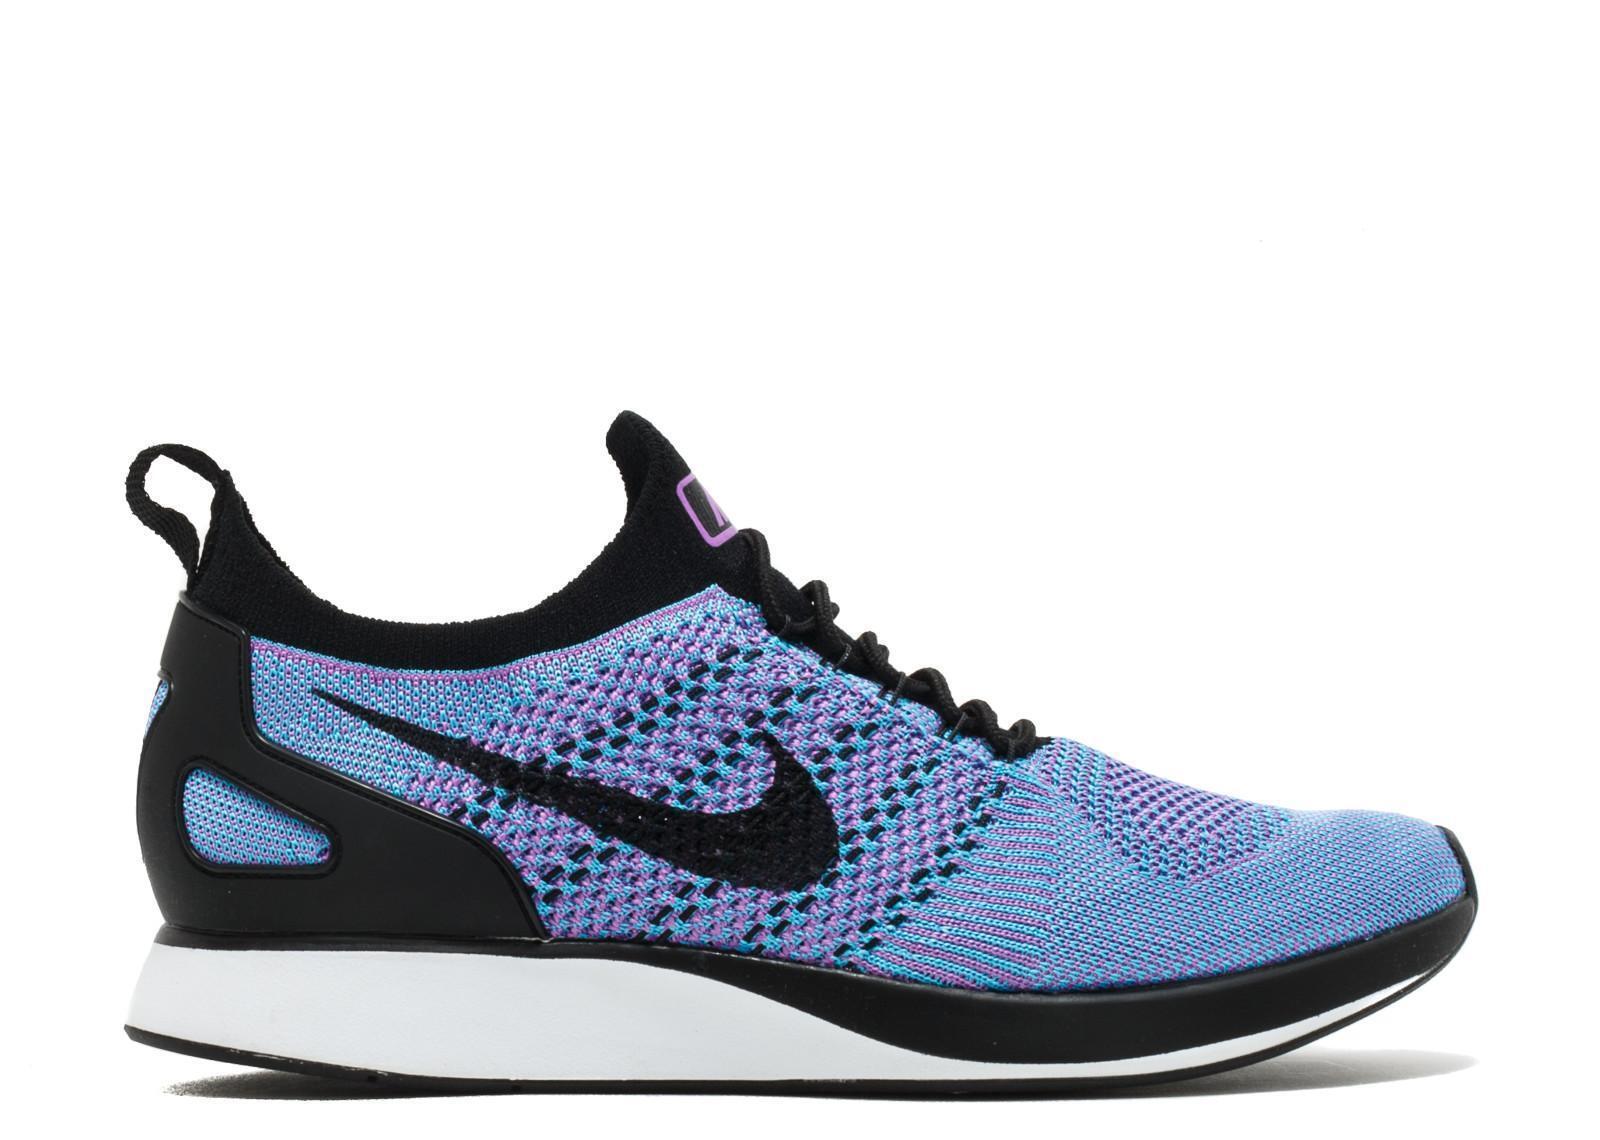 Herren Nike Luft Zoom Mariah Flyknit Racer Helllilat Turnschuhe 918264 918264 918264 500 fbe8f8